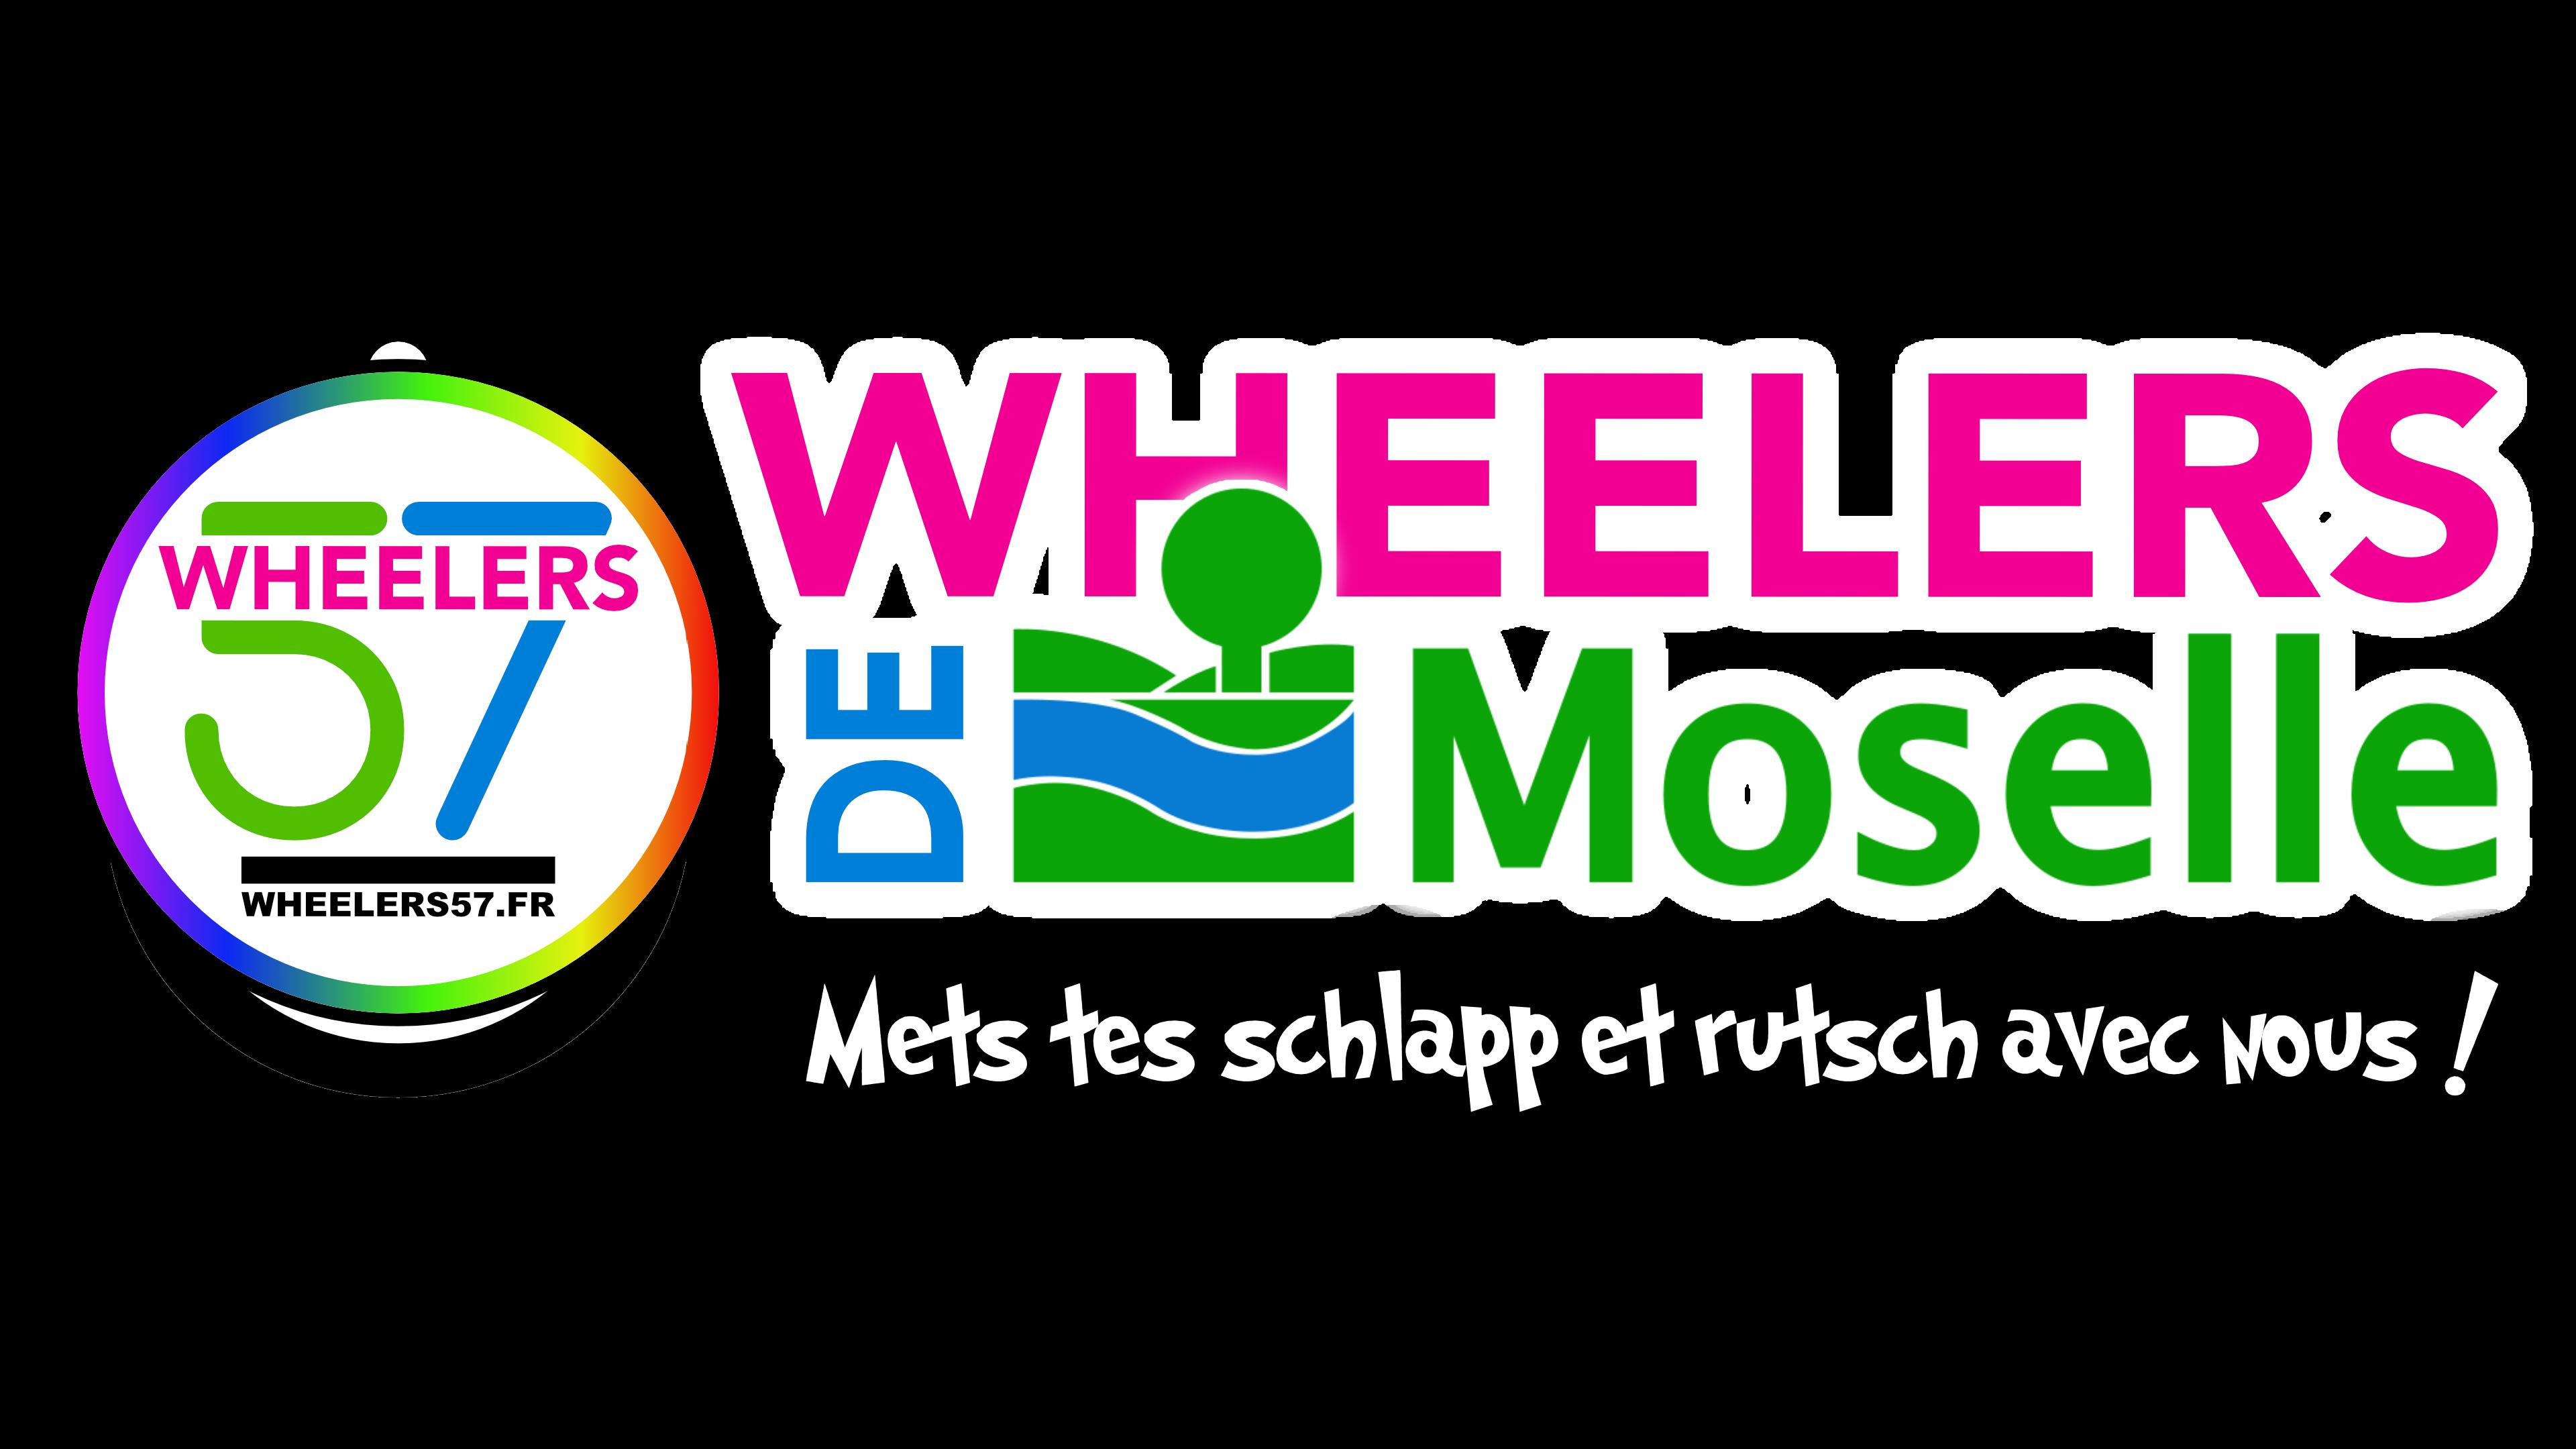 Wheelers de Moselle